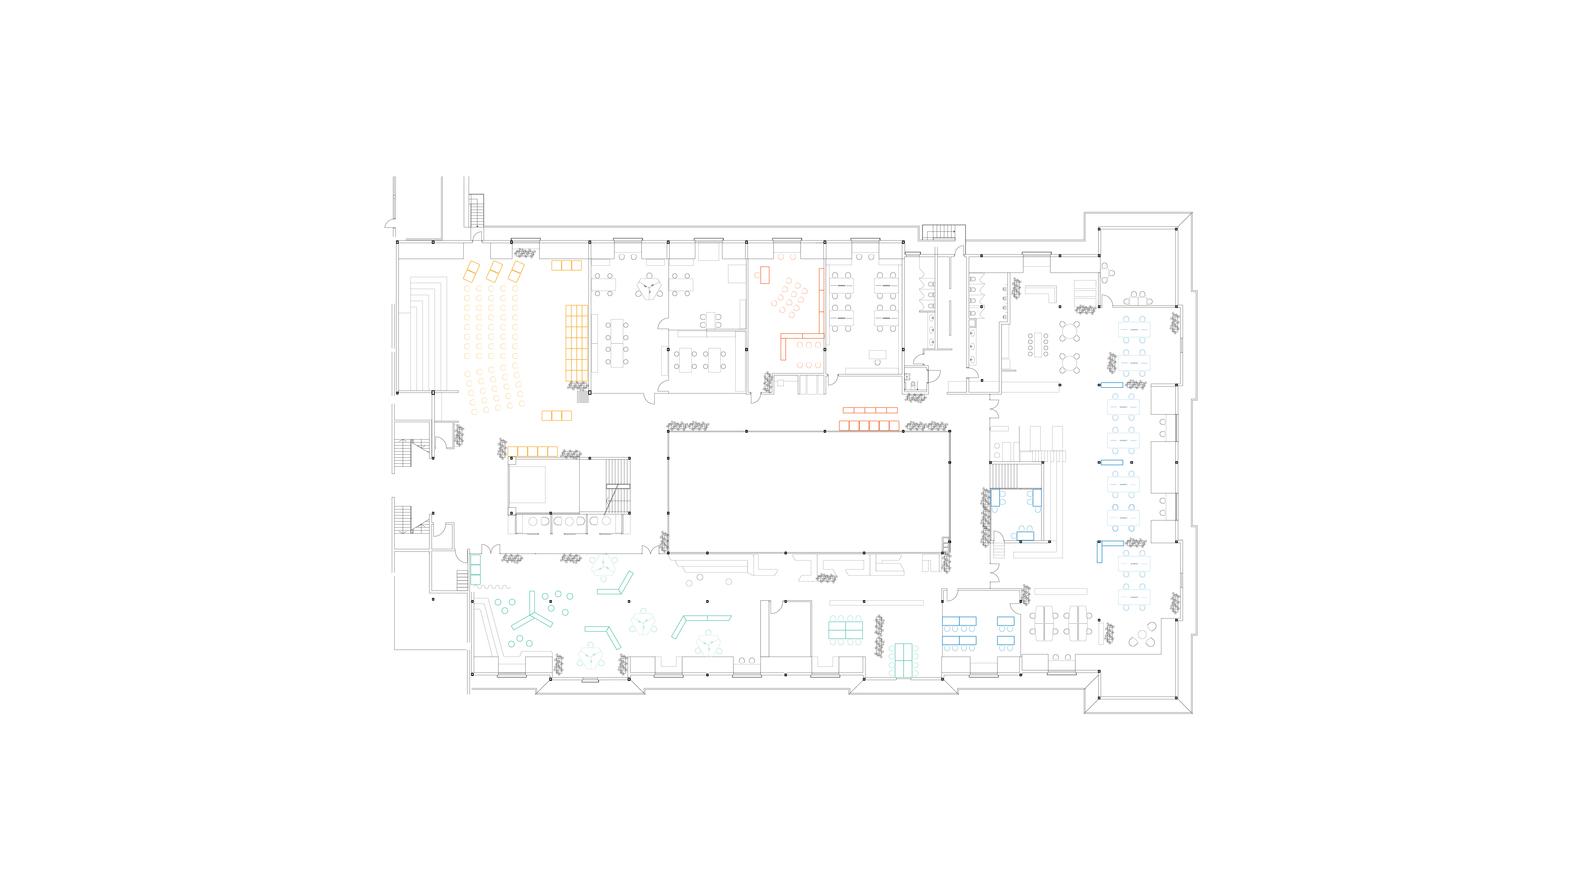 hight resolution of private sezin school open roof space floor plan